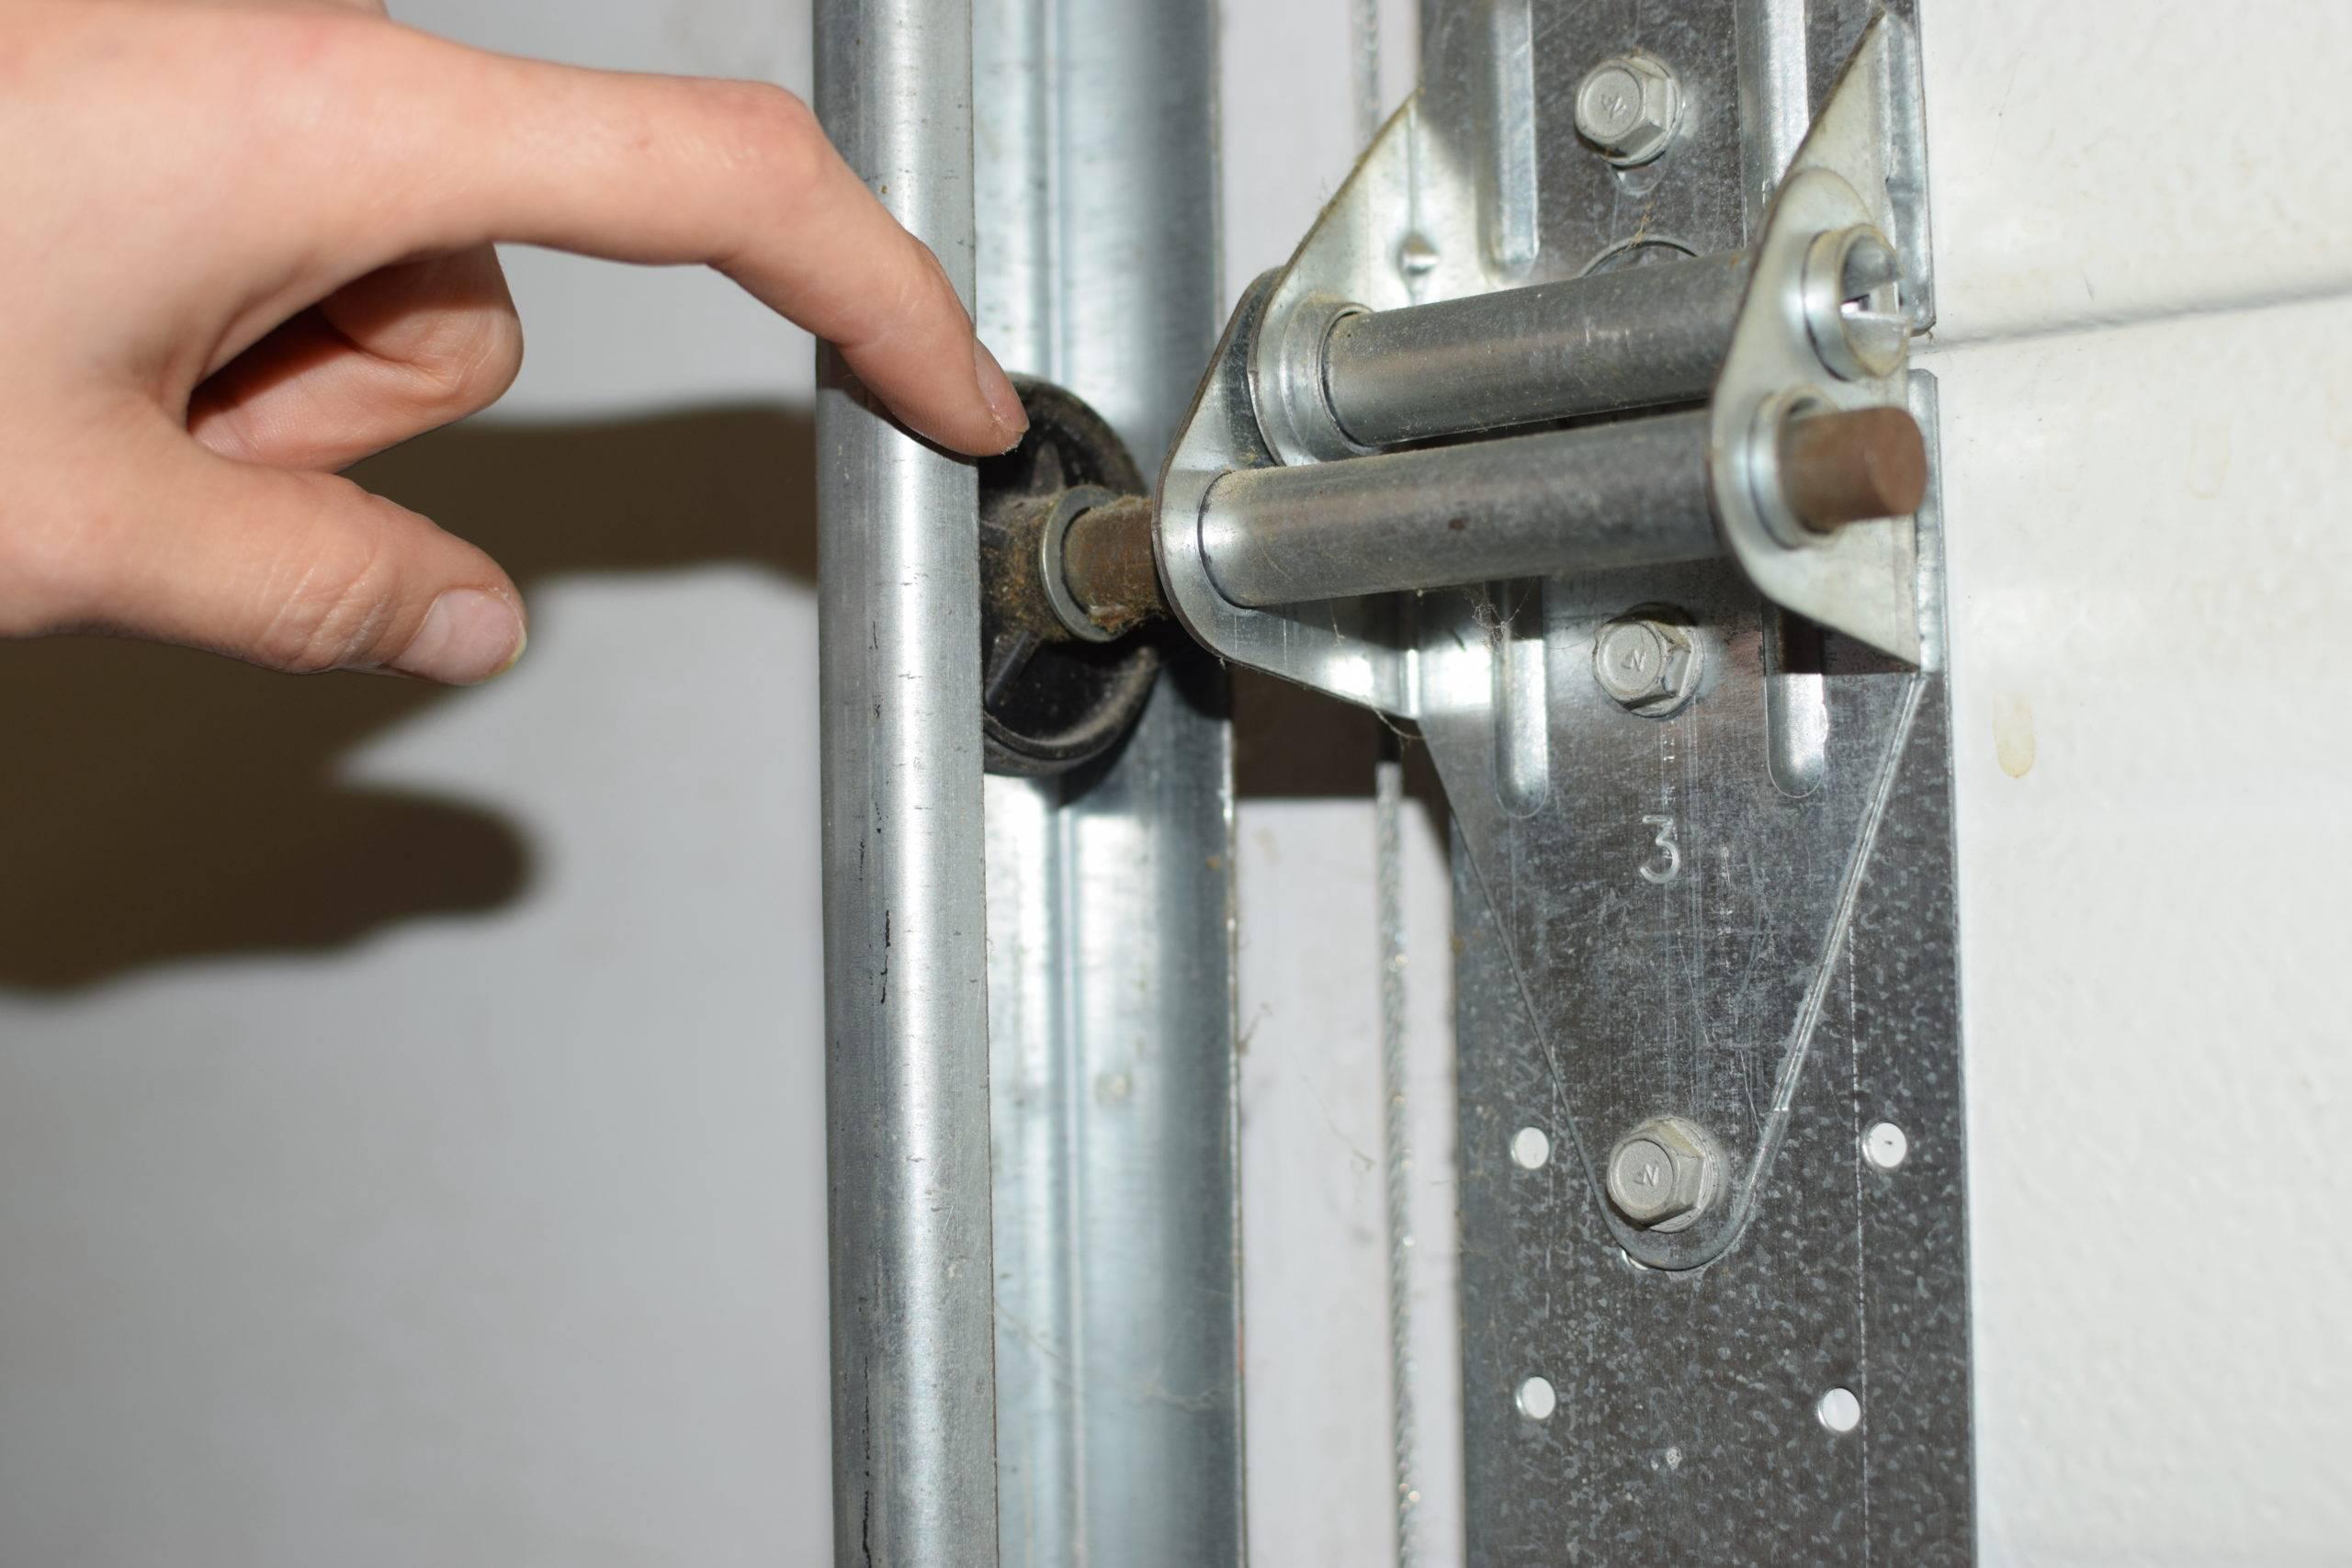 Finger pointing at garage door rollers